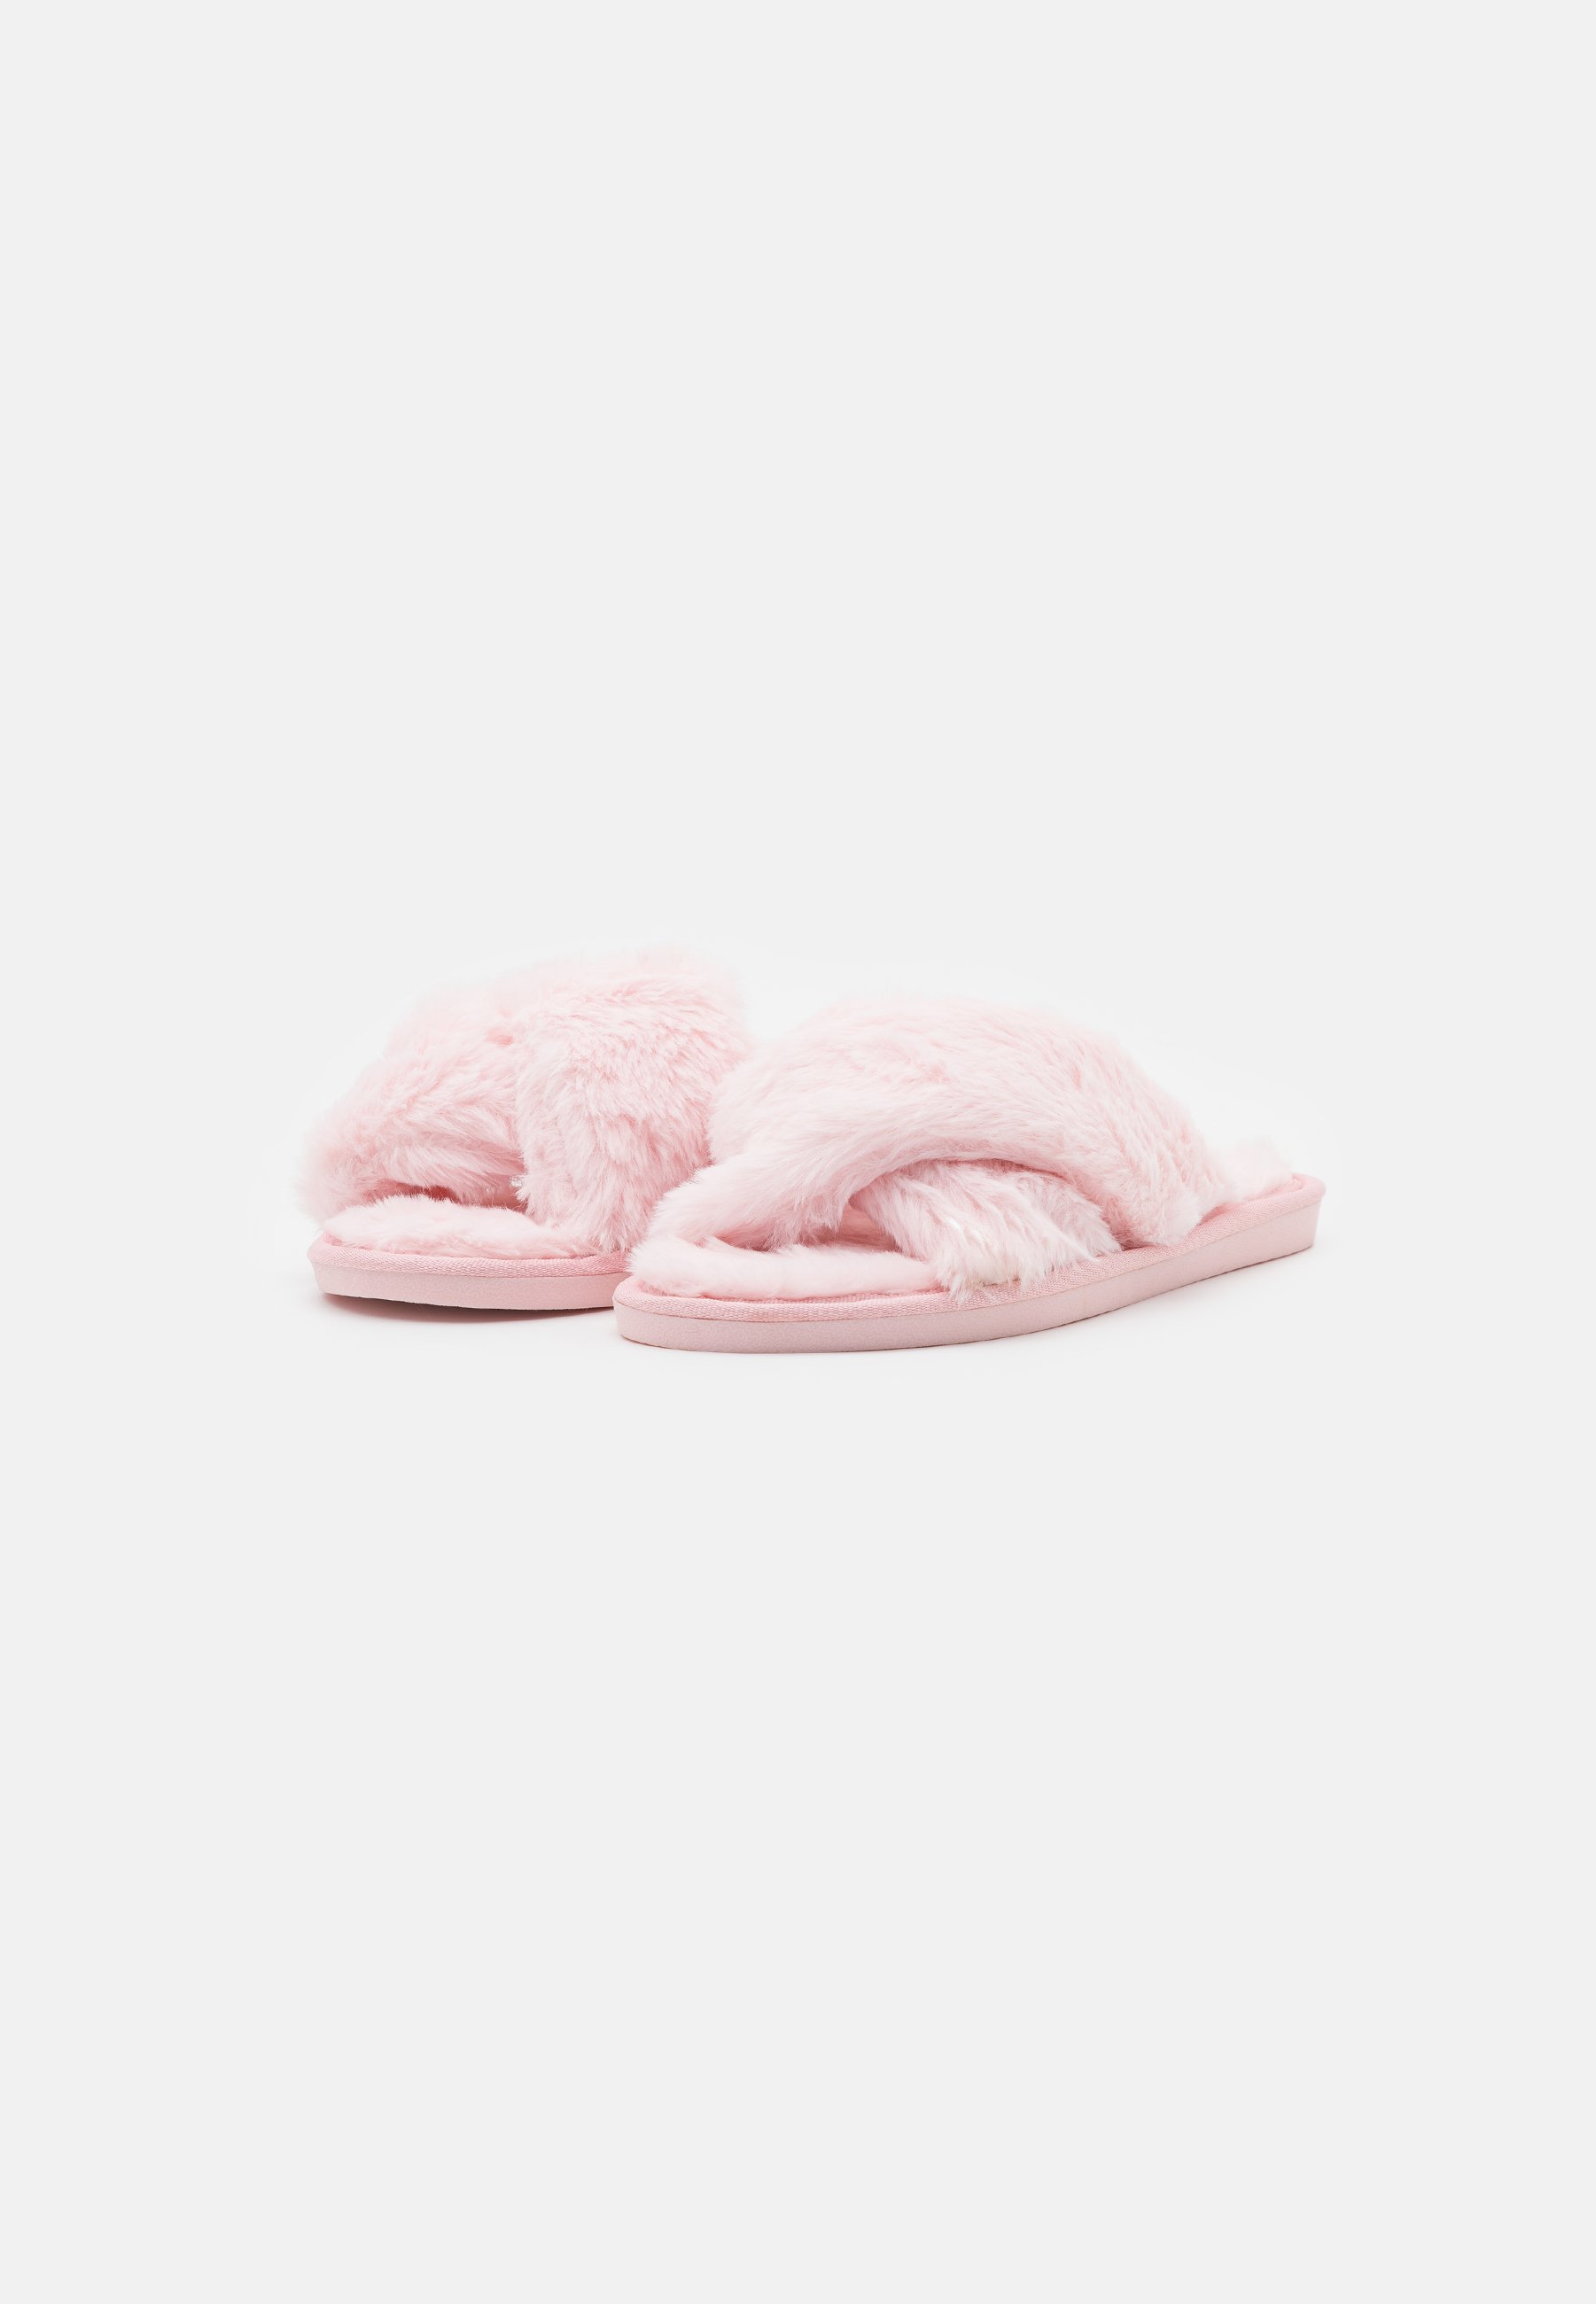 Raid Nicki - Pantolette Flach Blush/rosa